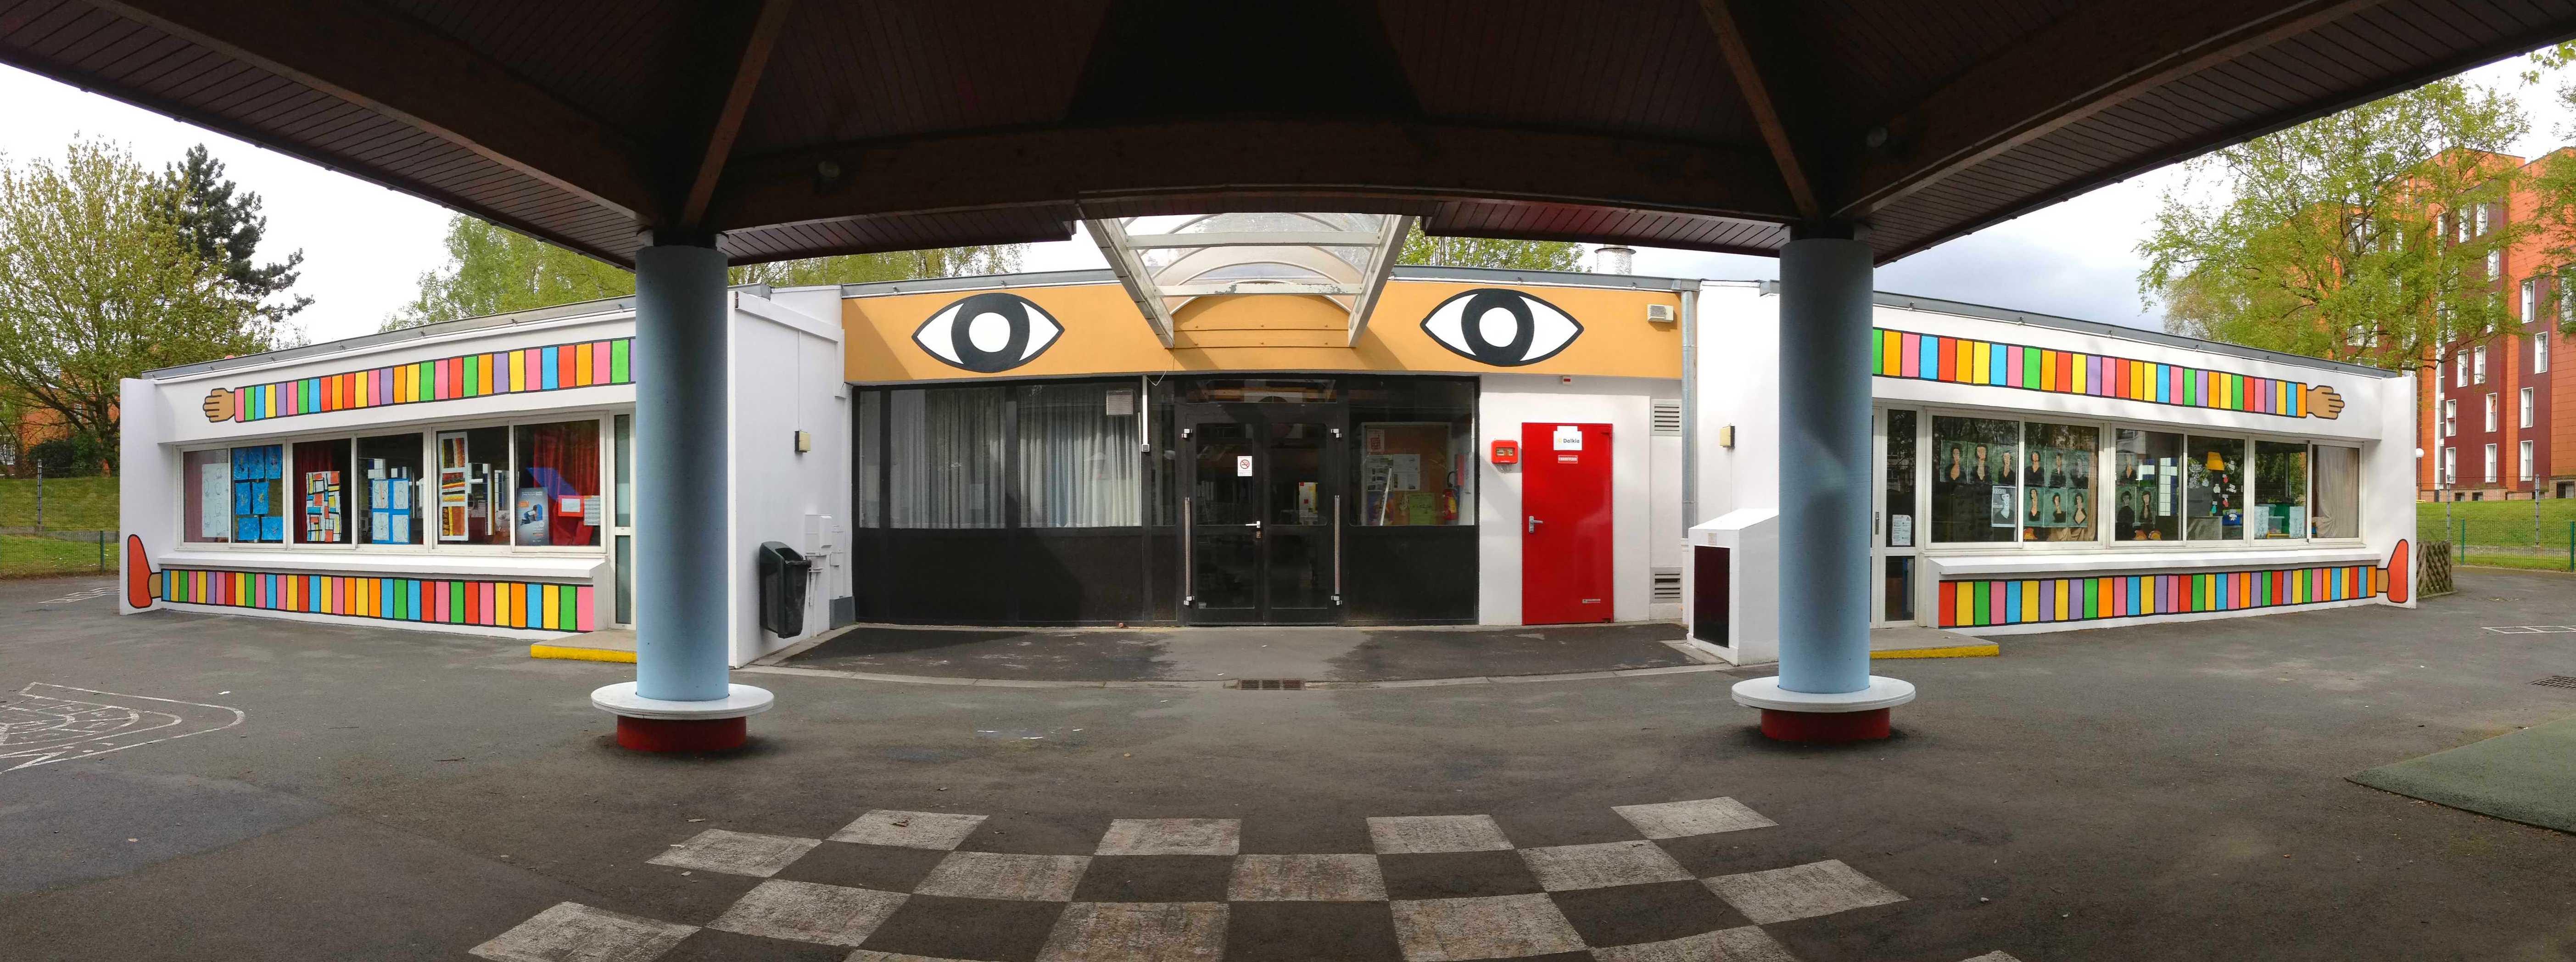 Fresque murale moderne architecture design - Fresque murale moderne ...